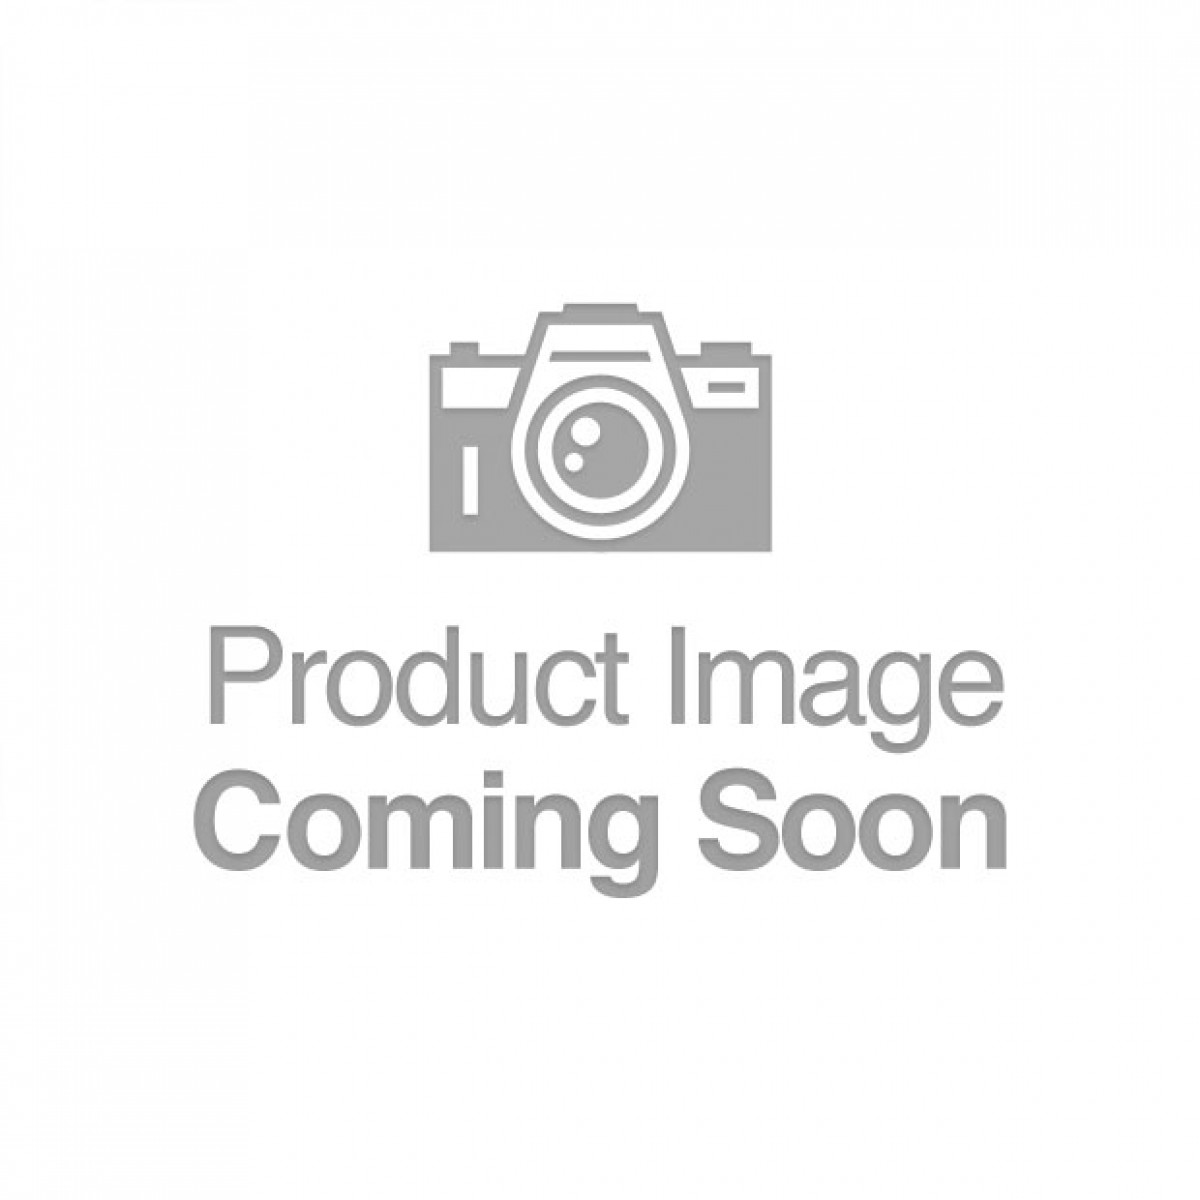 Oxballs Ergo Buttplug X Small - Platinum Swirl